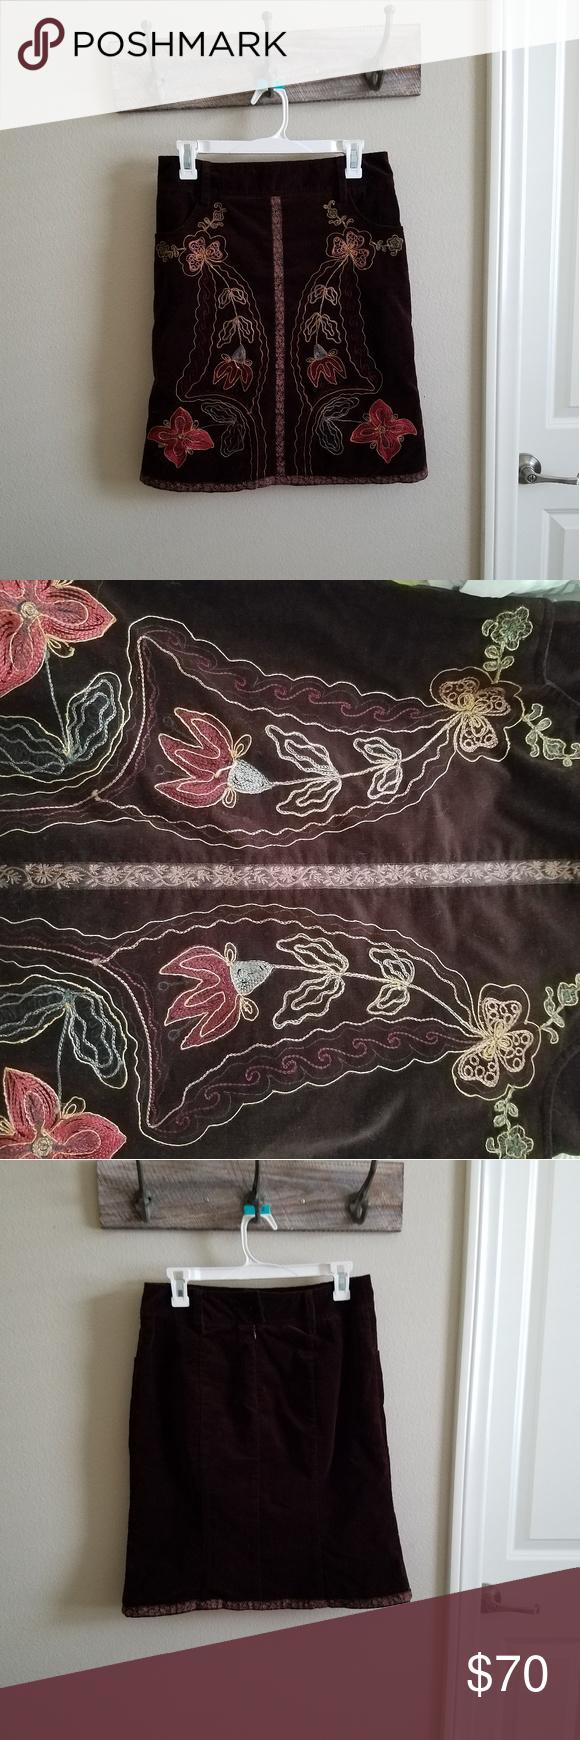 Nanette Lepore Embroidered Corduroy Skirt Corduroy Skirt